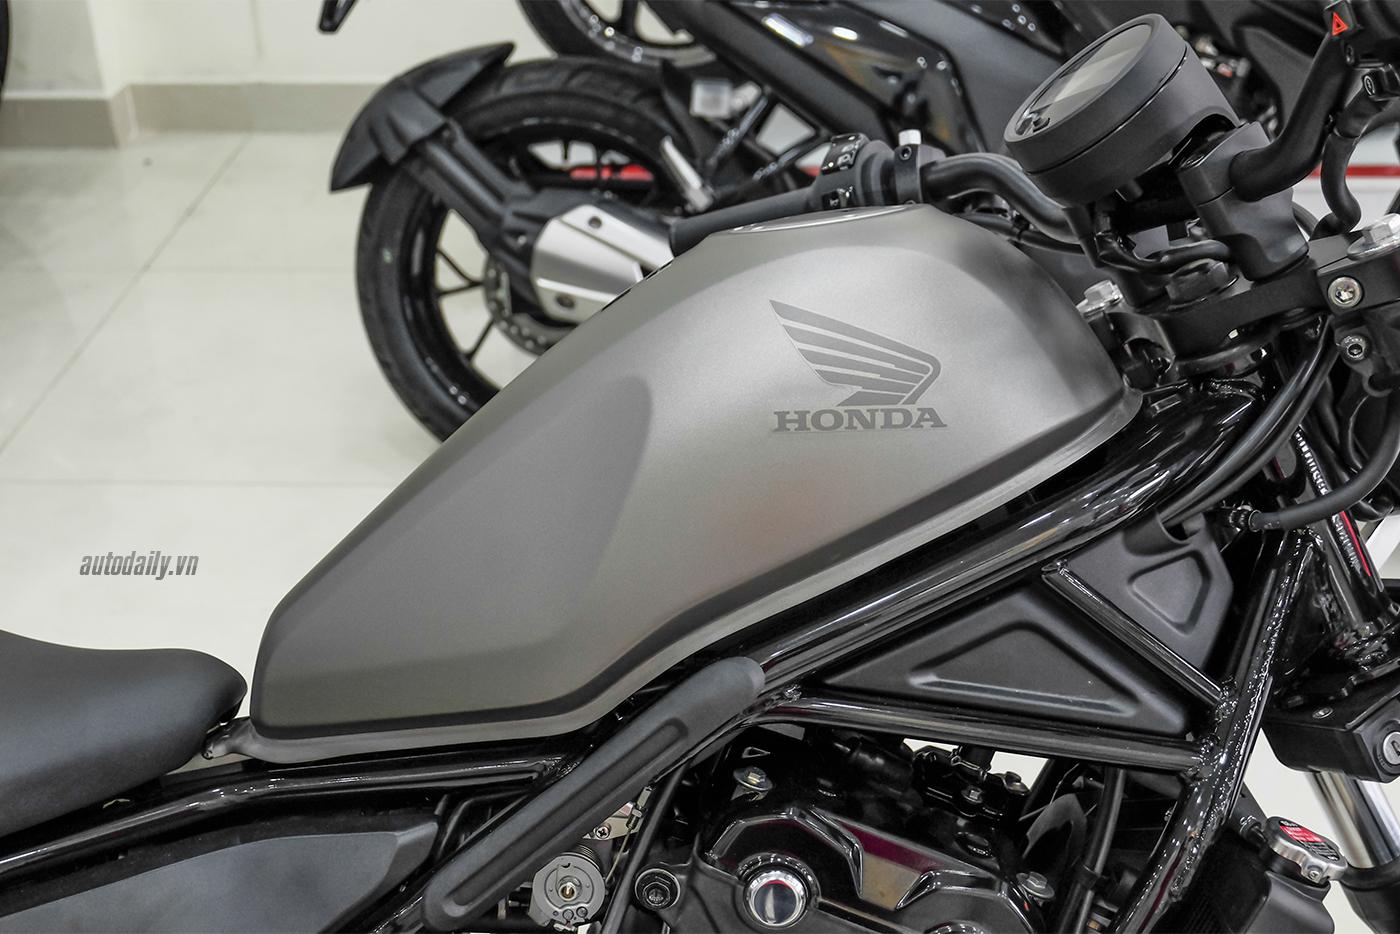 honda-rebel-500-abs-2017-12-1.jpg